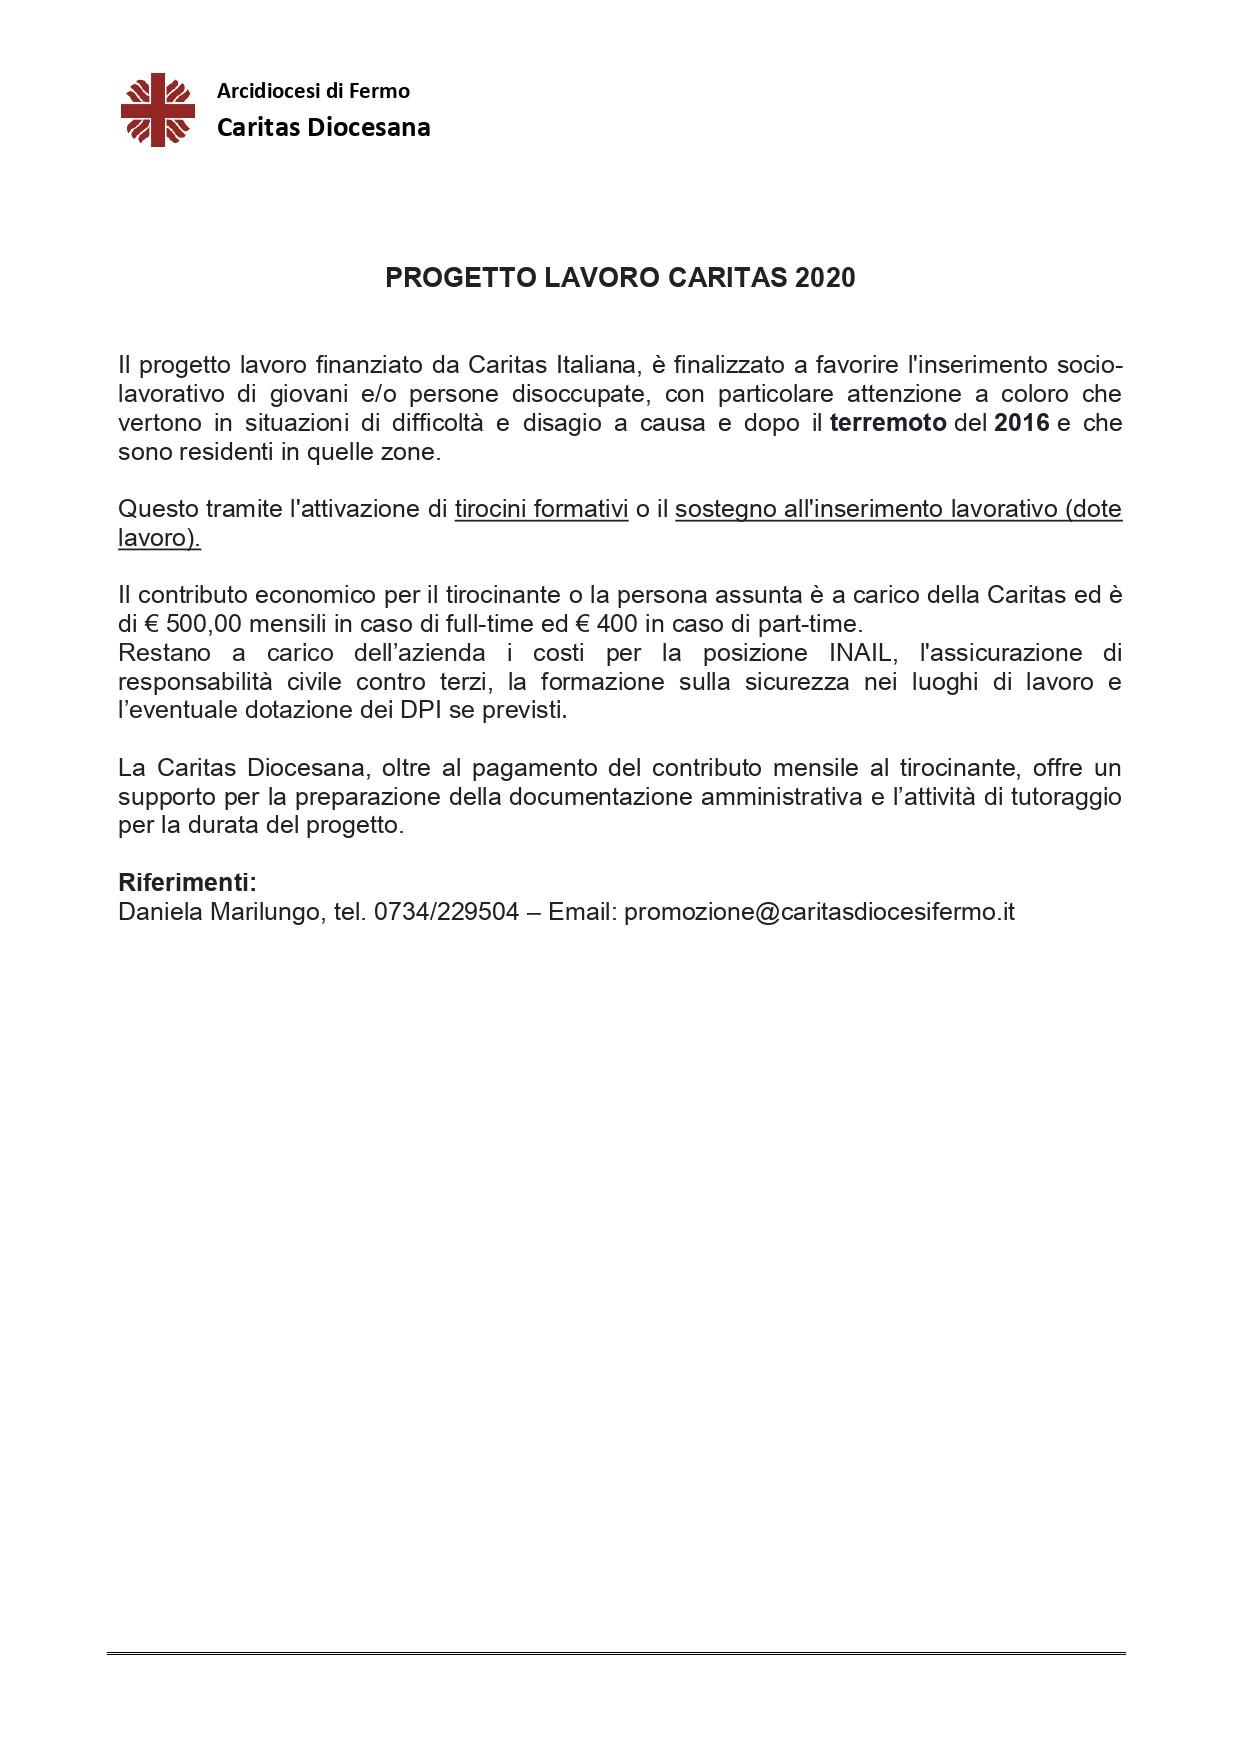 Scheda sintetica_PROGETTO LAVORO CARITAS